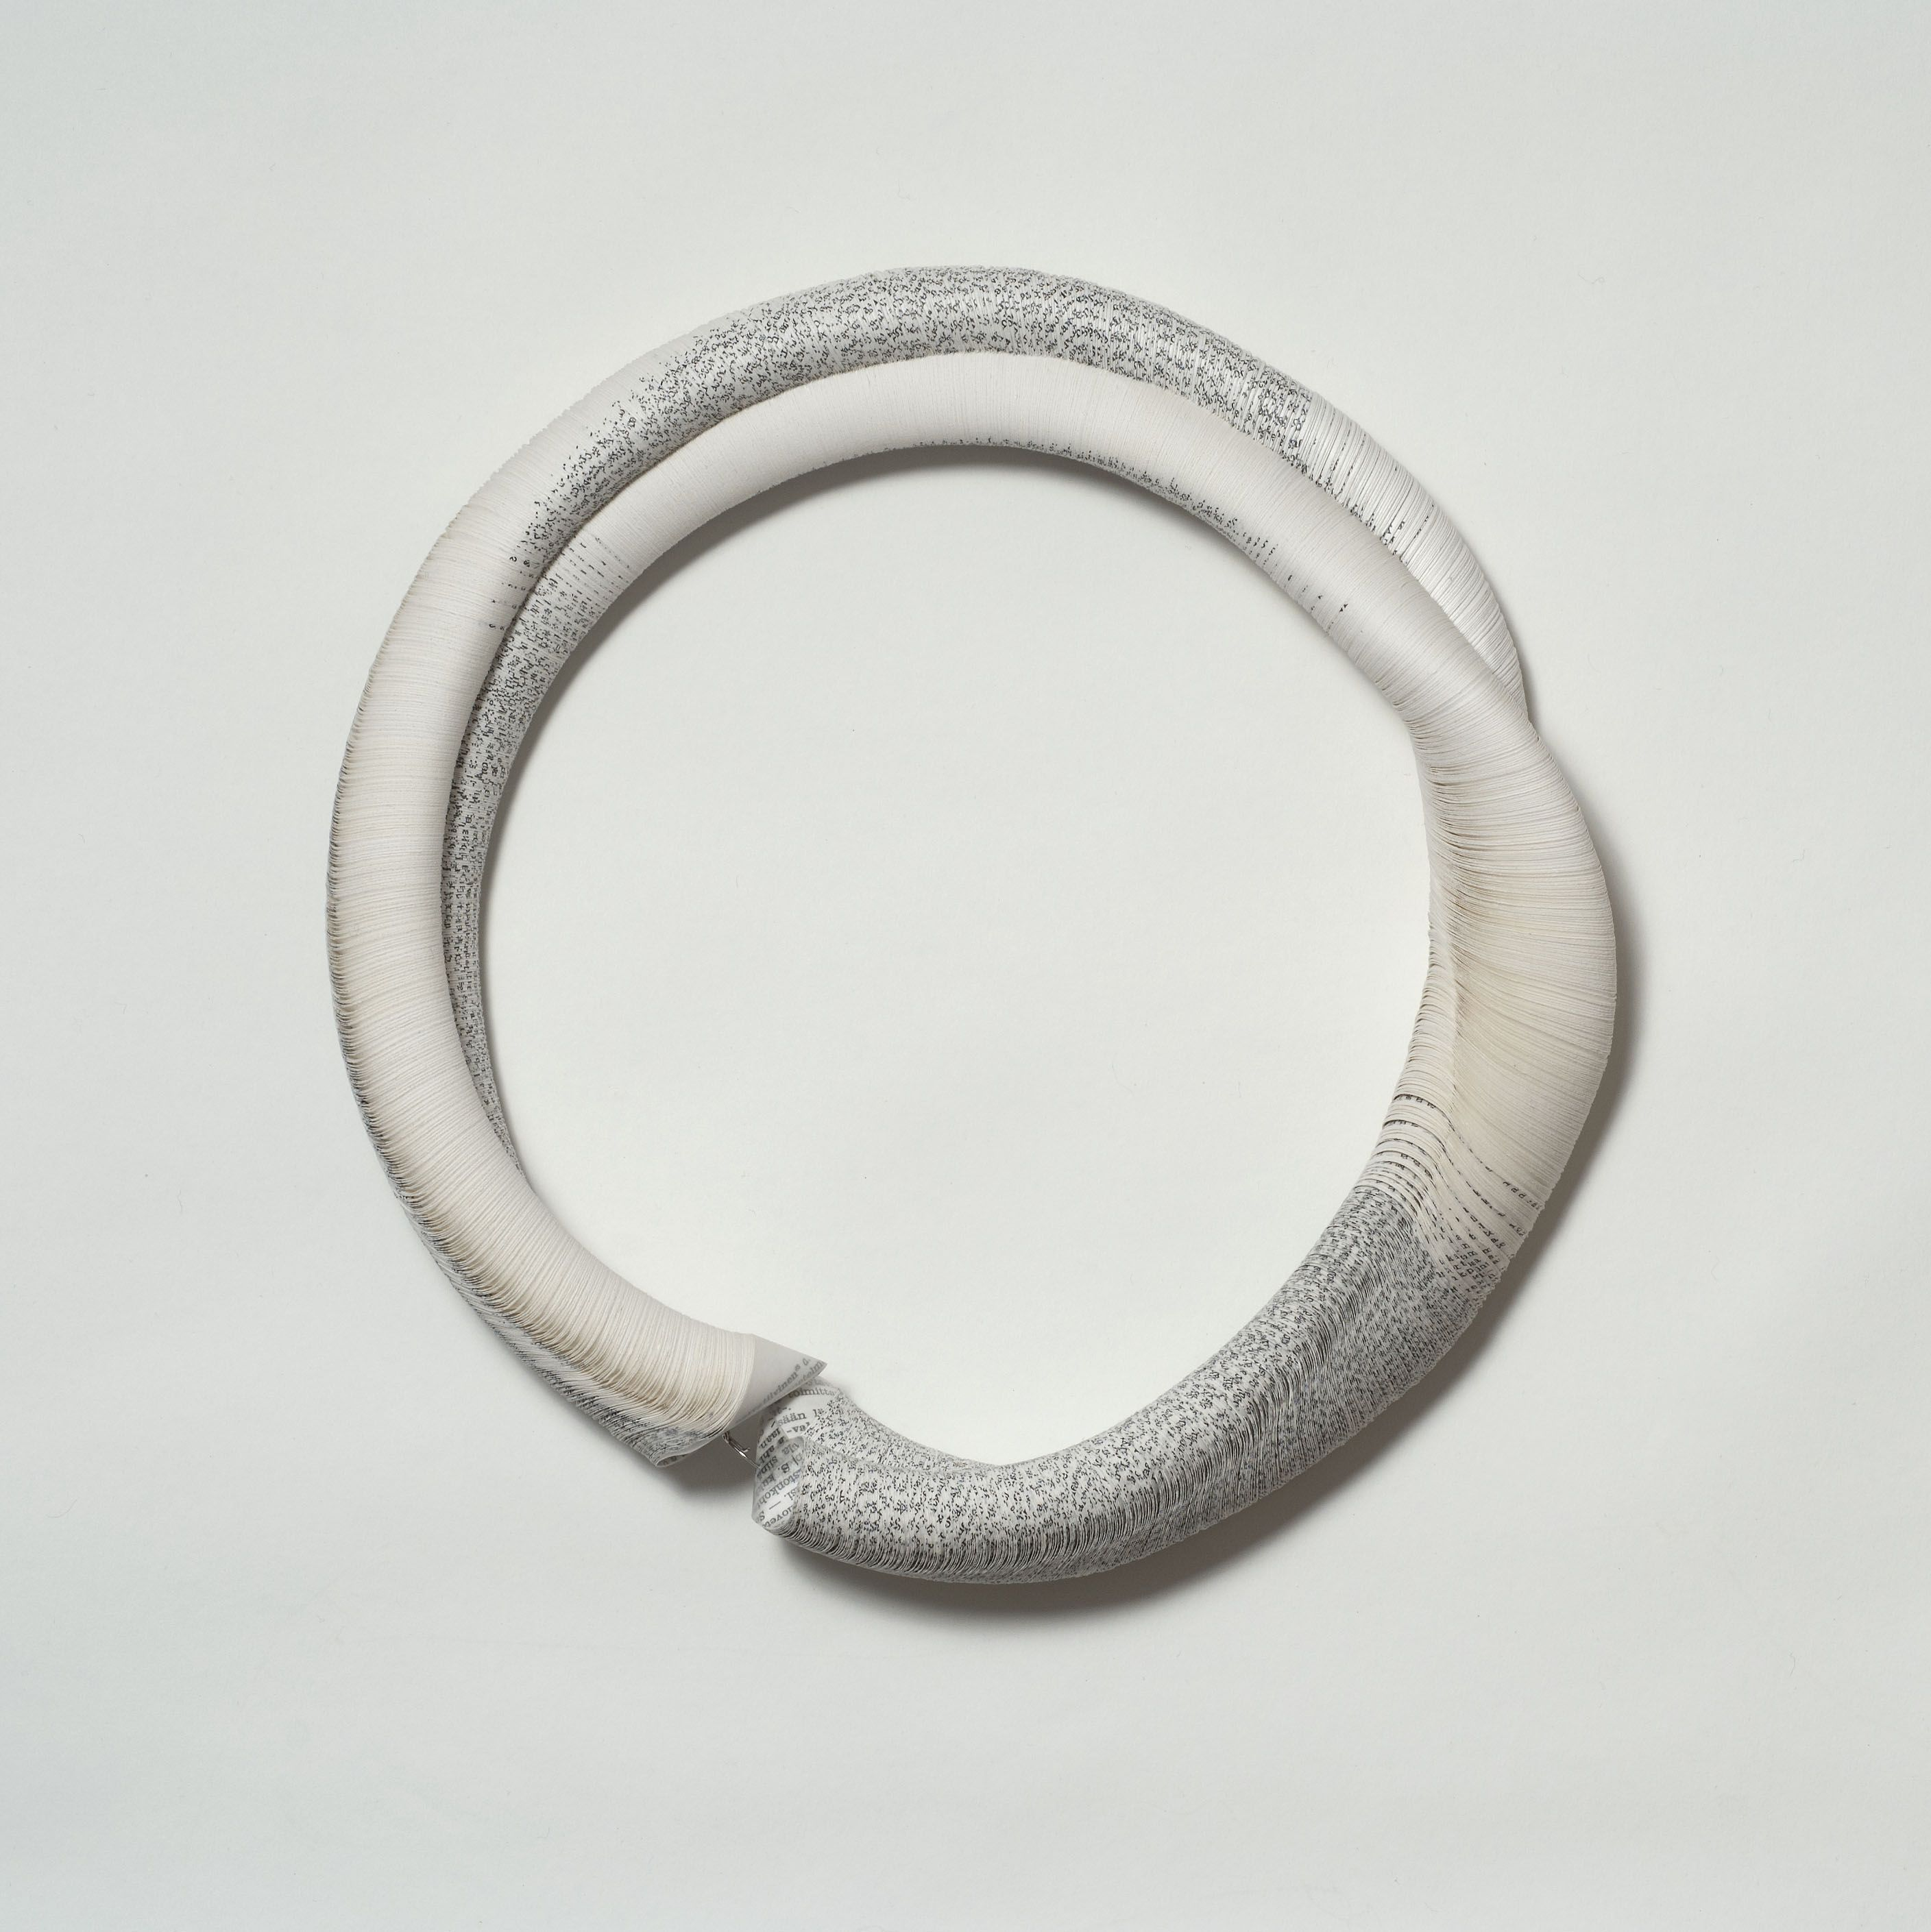 Janna Syvänoja, Finland, Necklace, 2003, recycled paper, steel wire